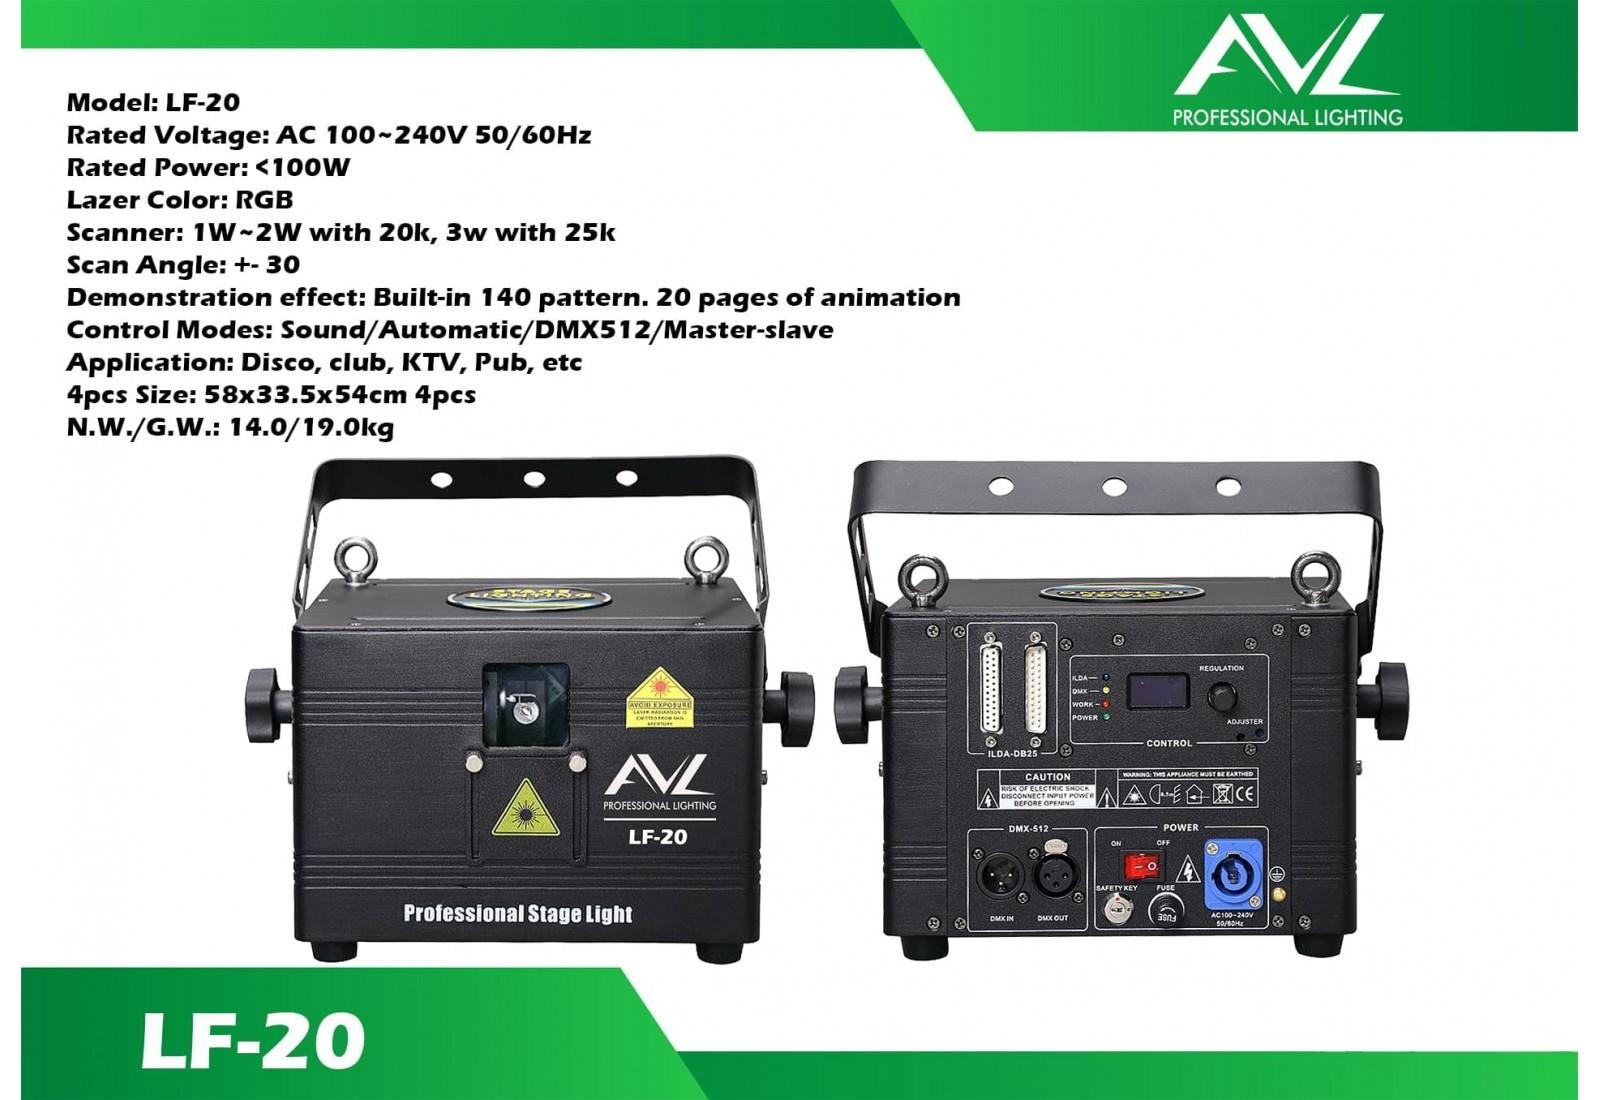 AVL LF-20